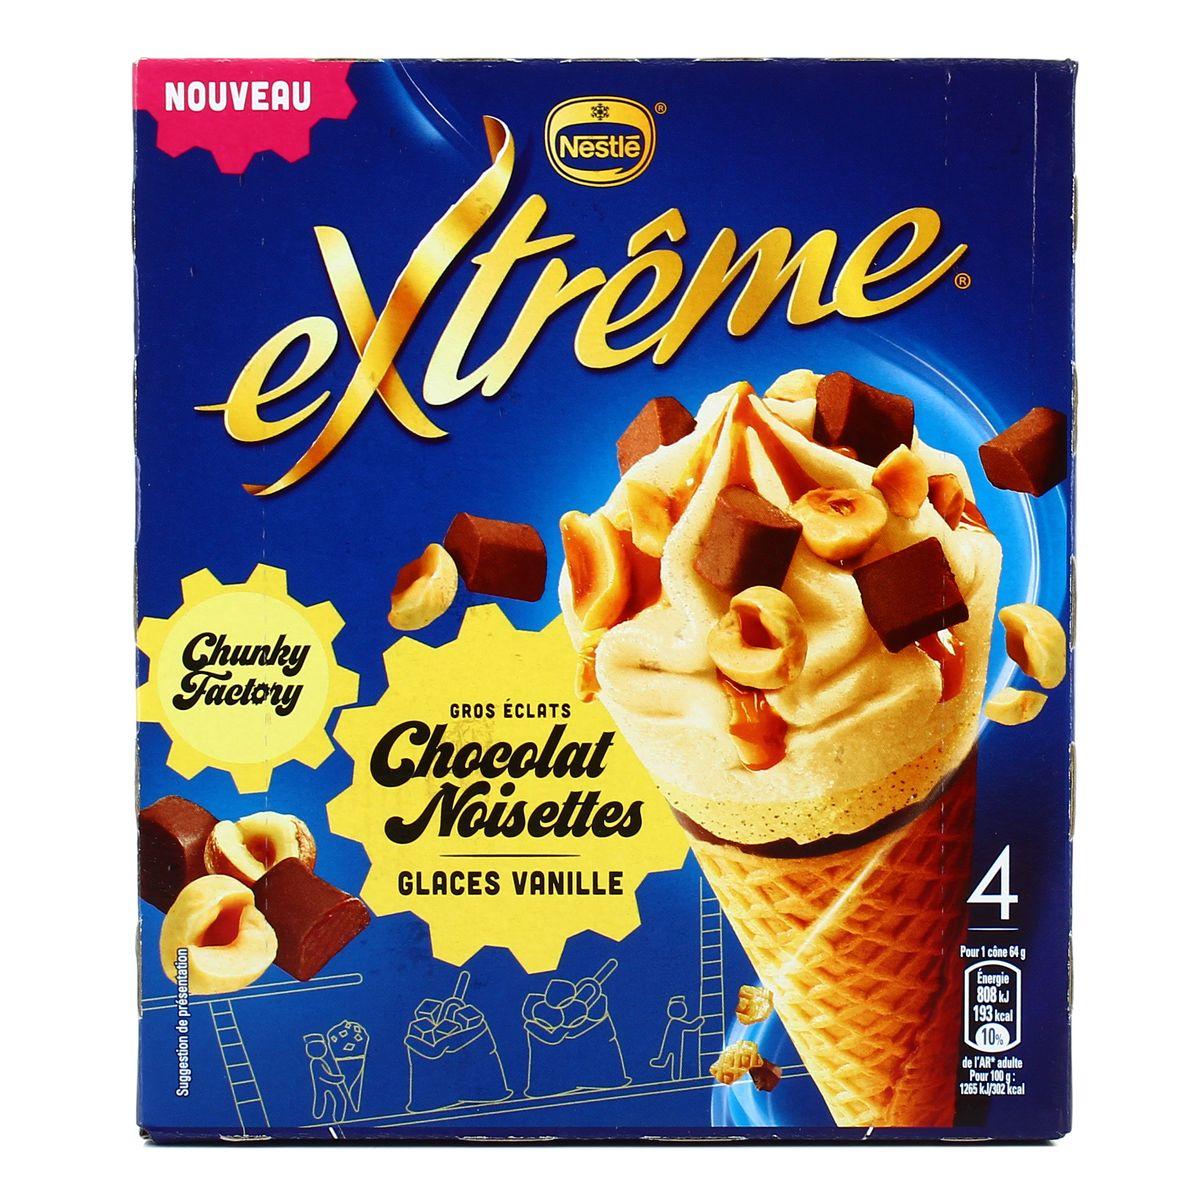 Cône Chuncky Factory Vanille Noisette, Extreme (x 4)